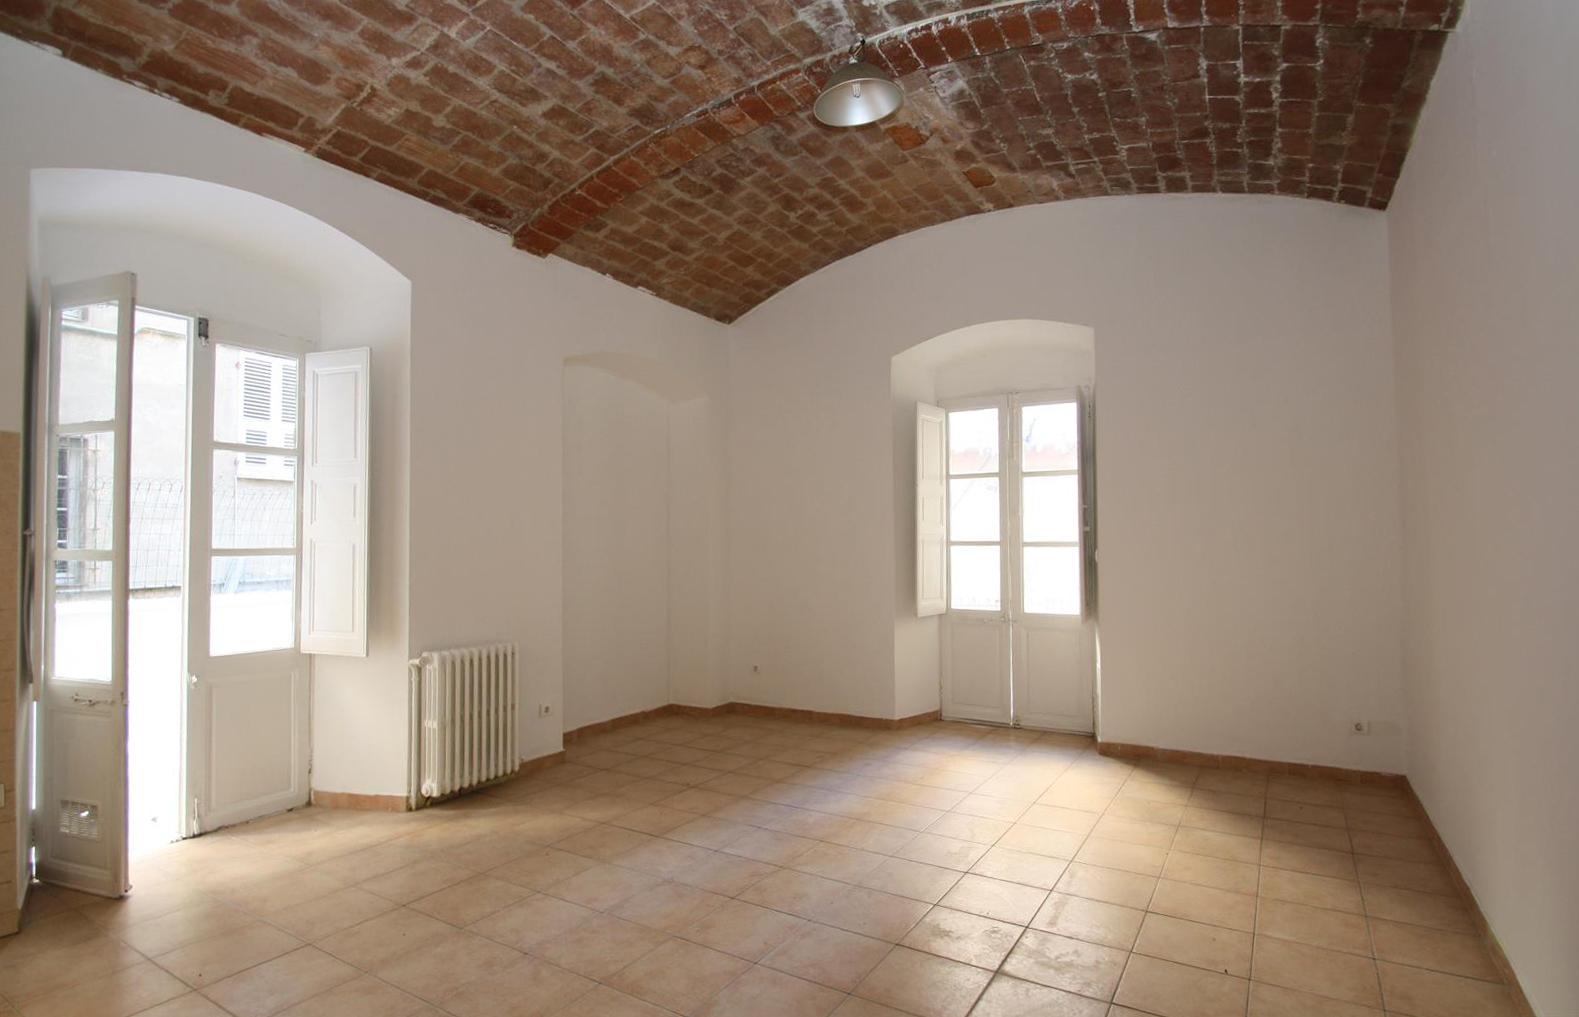 Bastia centre ville appartement agence immobili re for Agence immobiliere kalliste bastia